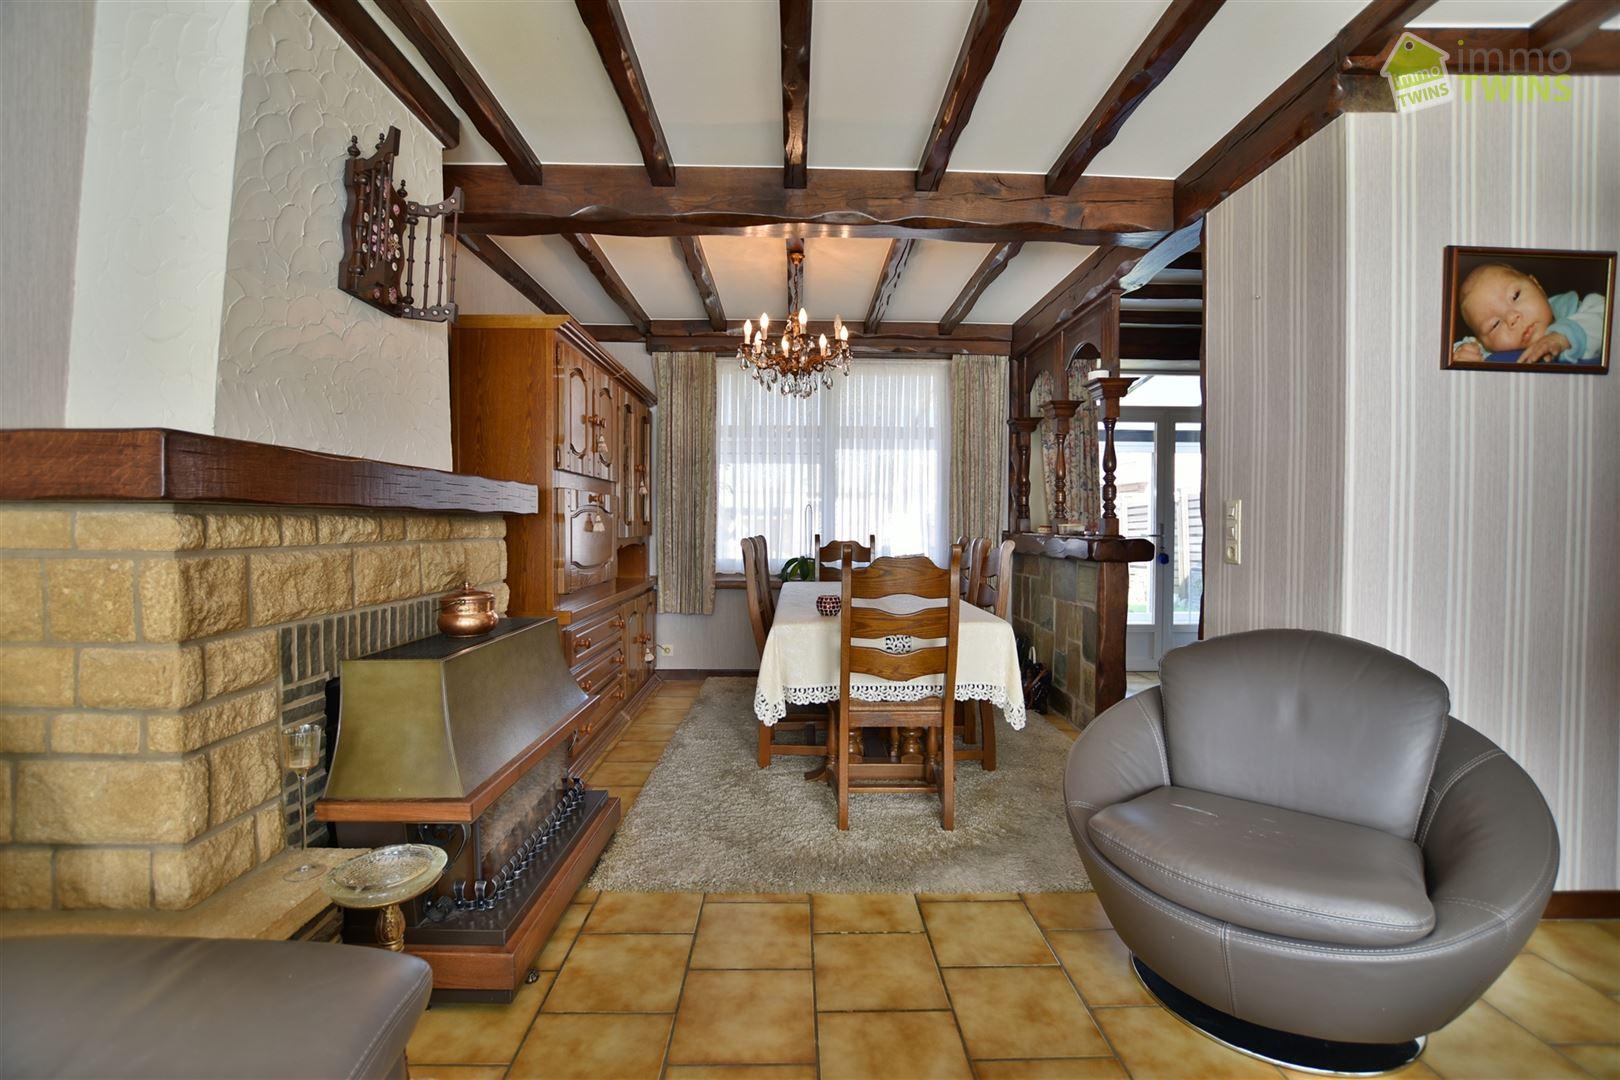 Foto 3 : Woning te 9200 SINT-GILLIS-BIJ-DENDERMONDE (België) - Prijs € 195.000